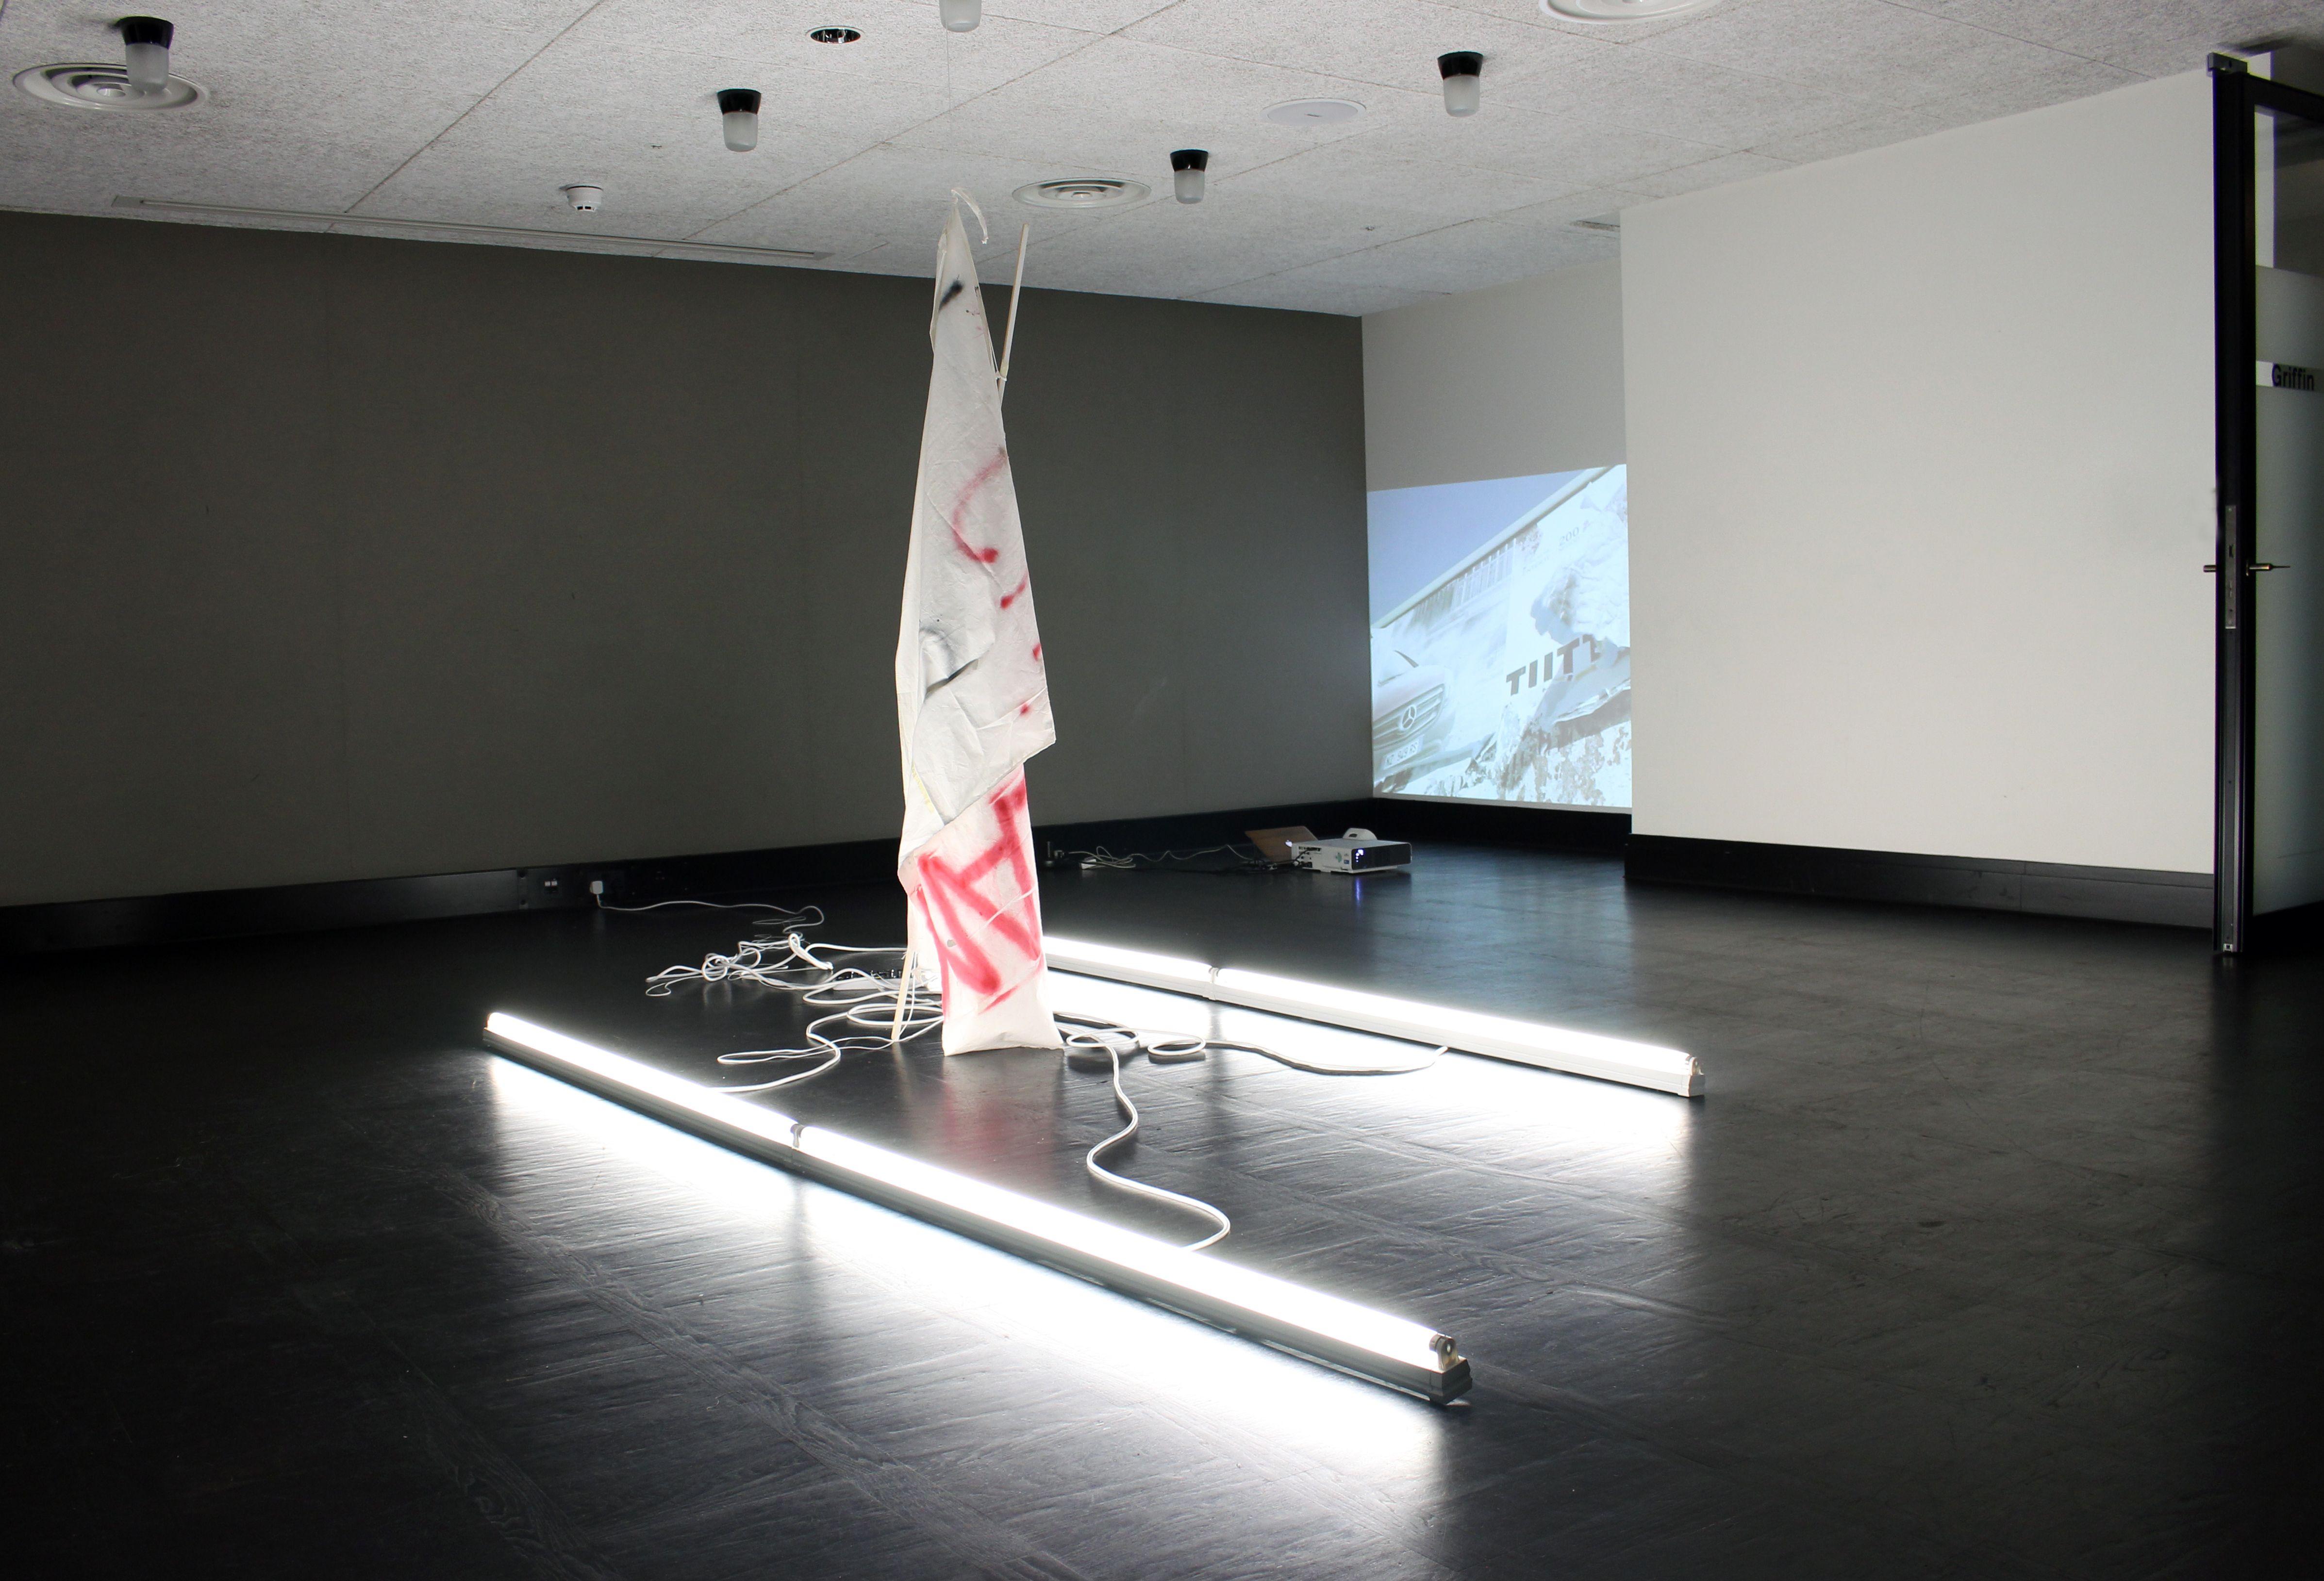 Webmobili Illuminazione ~ Https: www.mtart.agency artists francesco de prezzo 2